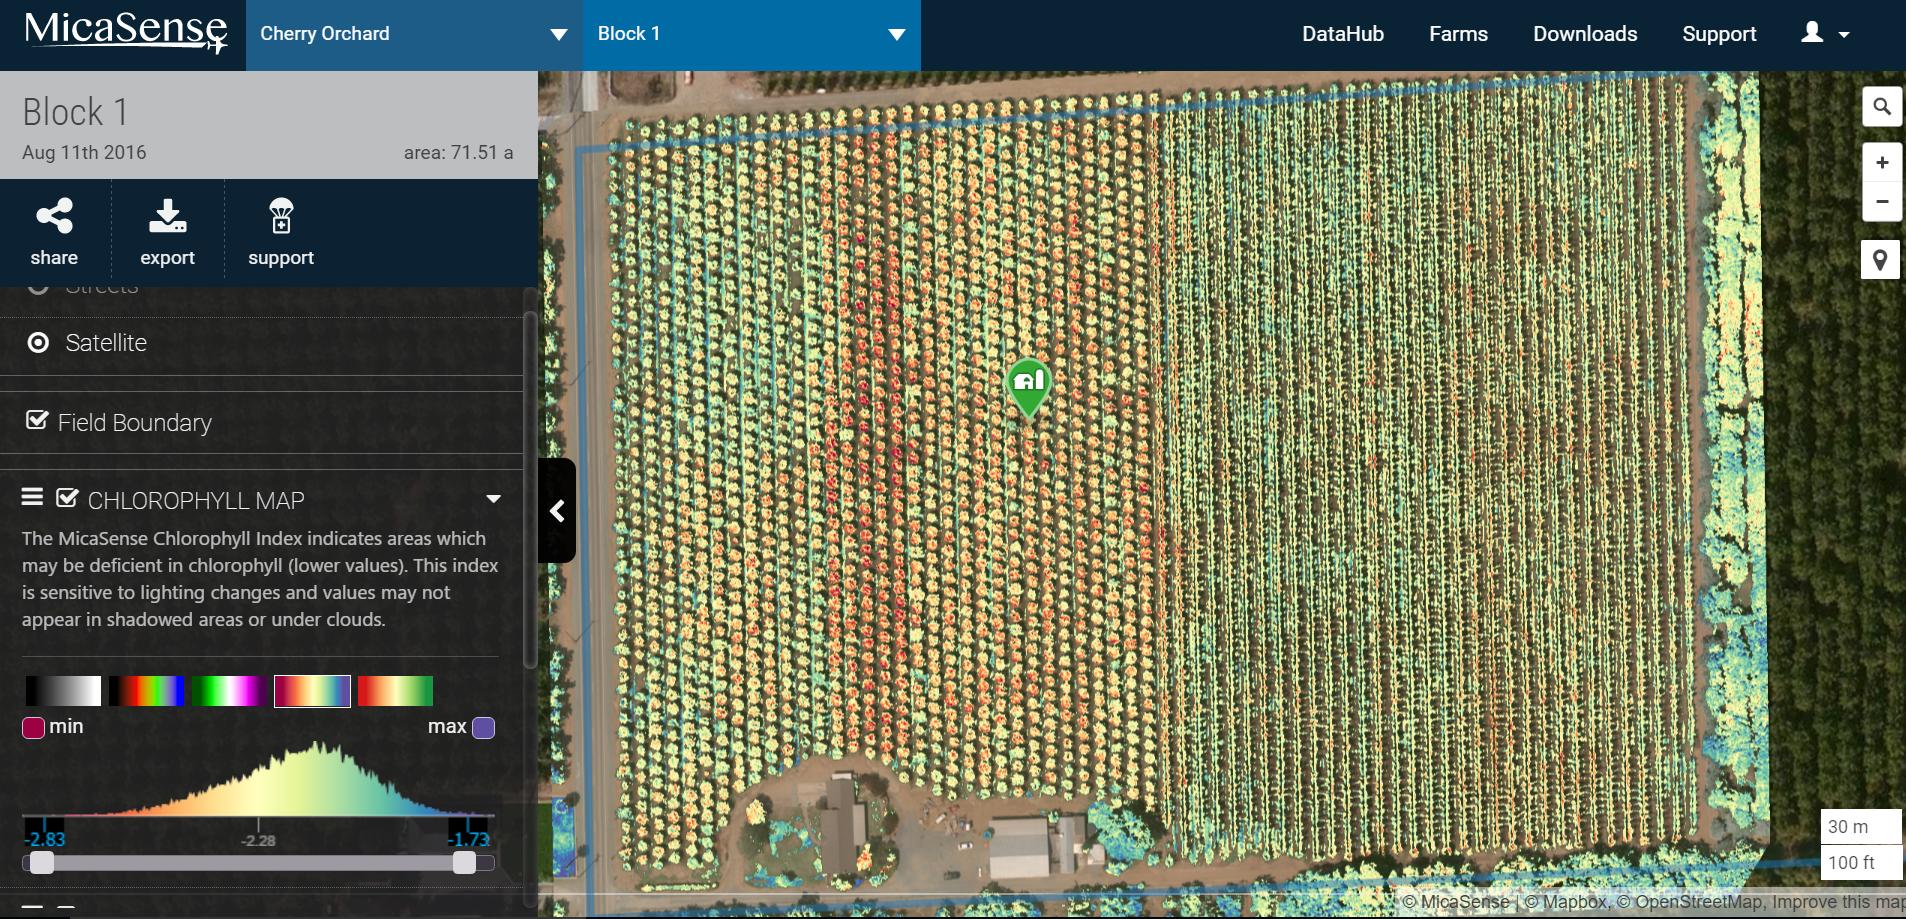 Interactive farm map